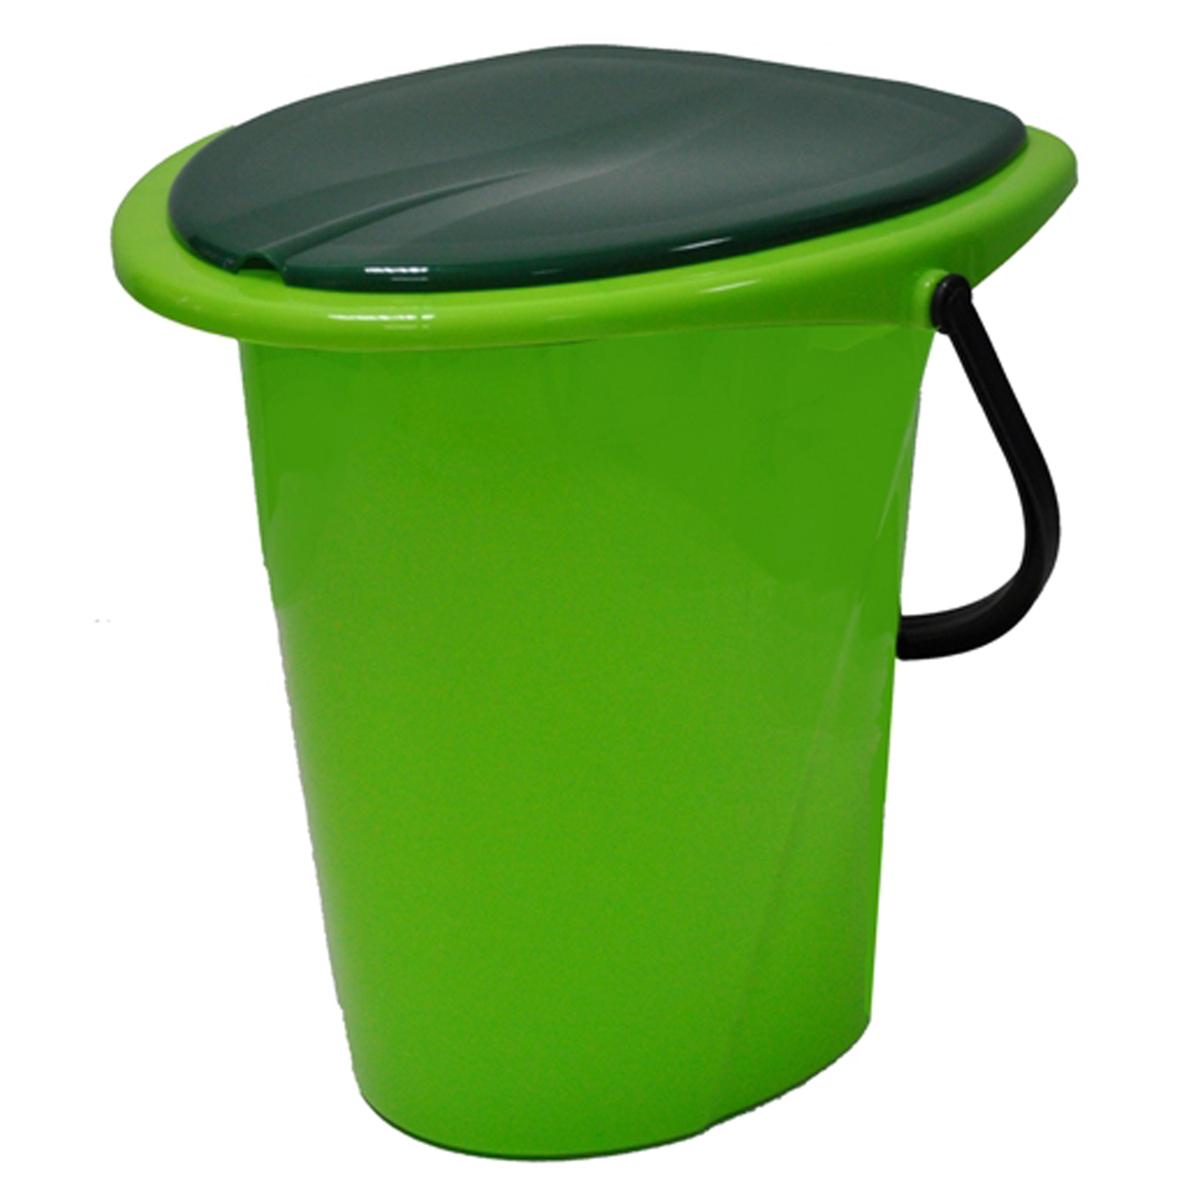 "Ведро-туалет ""InGreen"", цвет: зеленый, салатовый, 17 л ING30001СЛ-7РS"